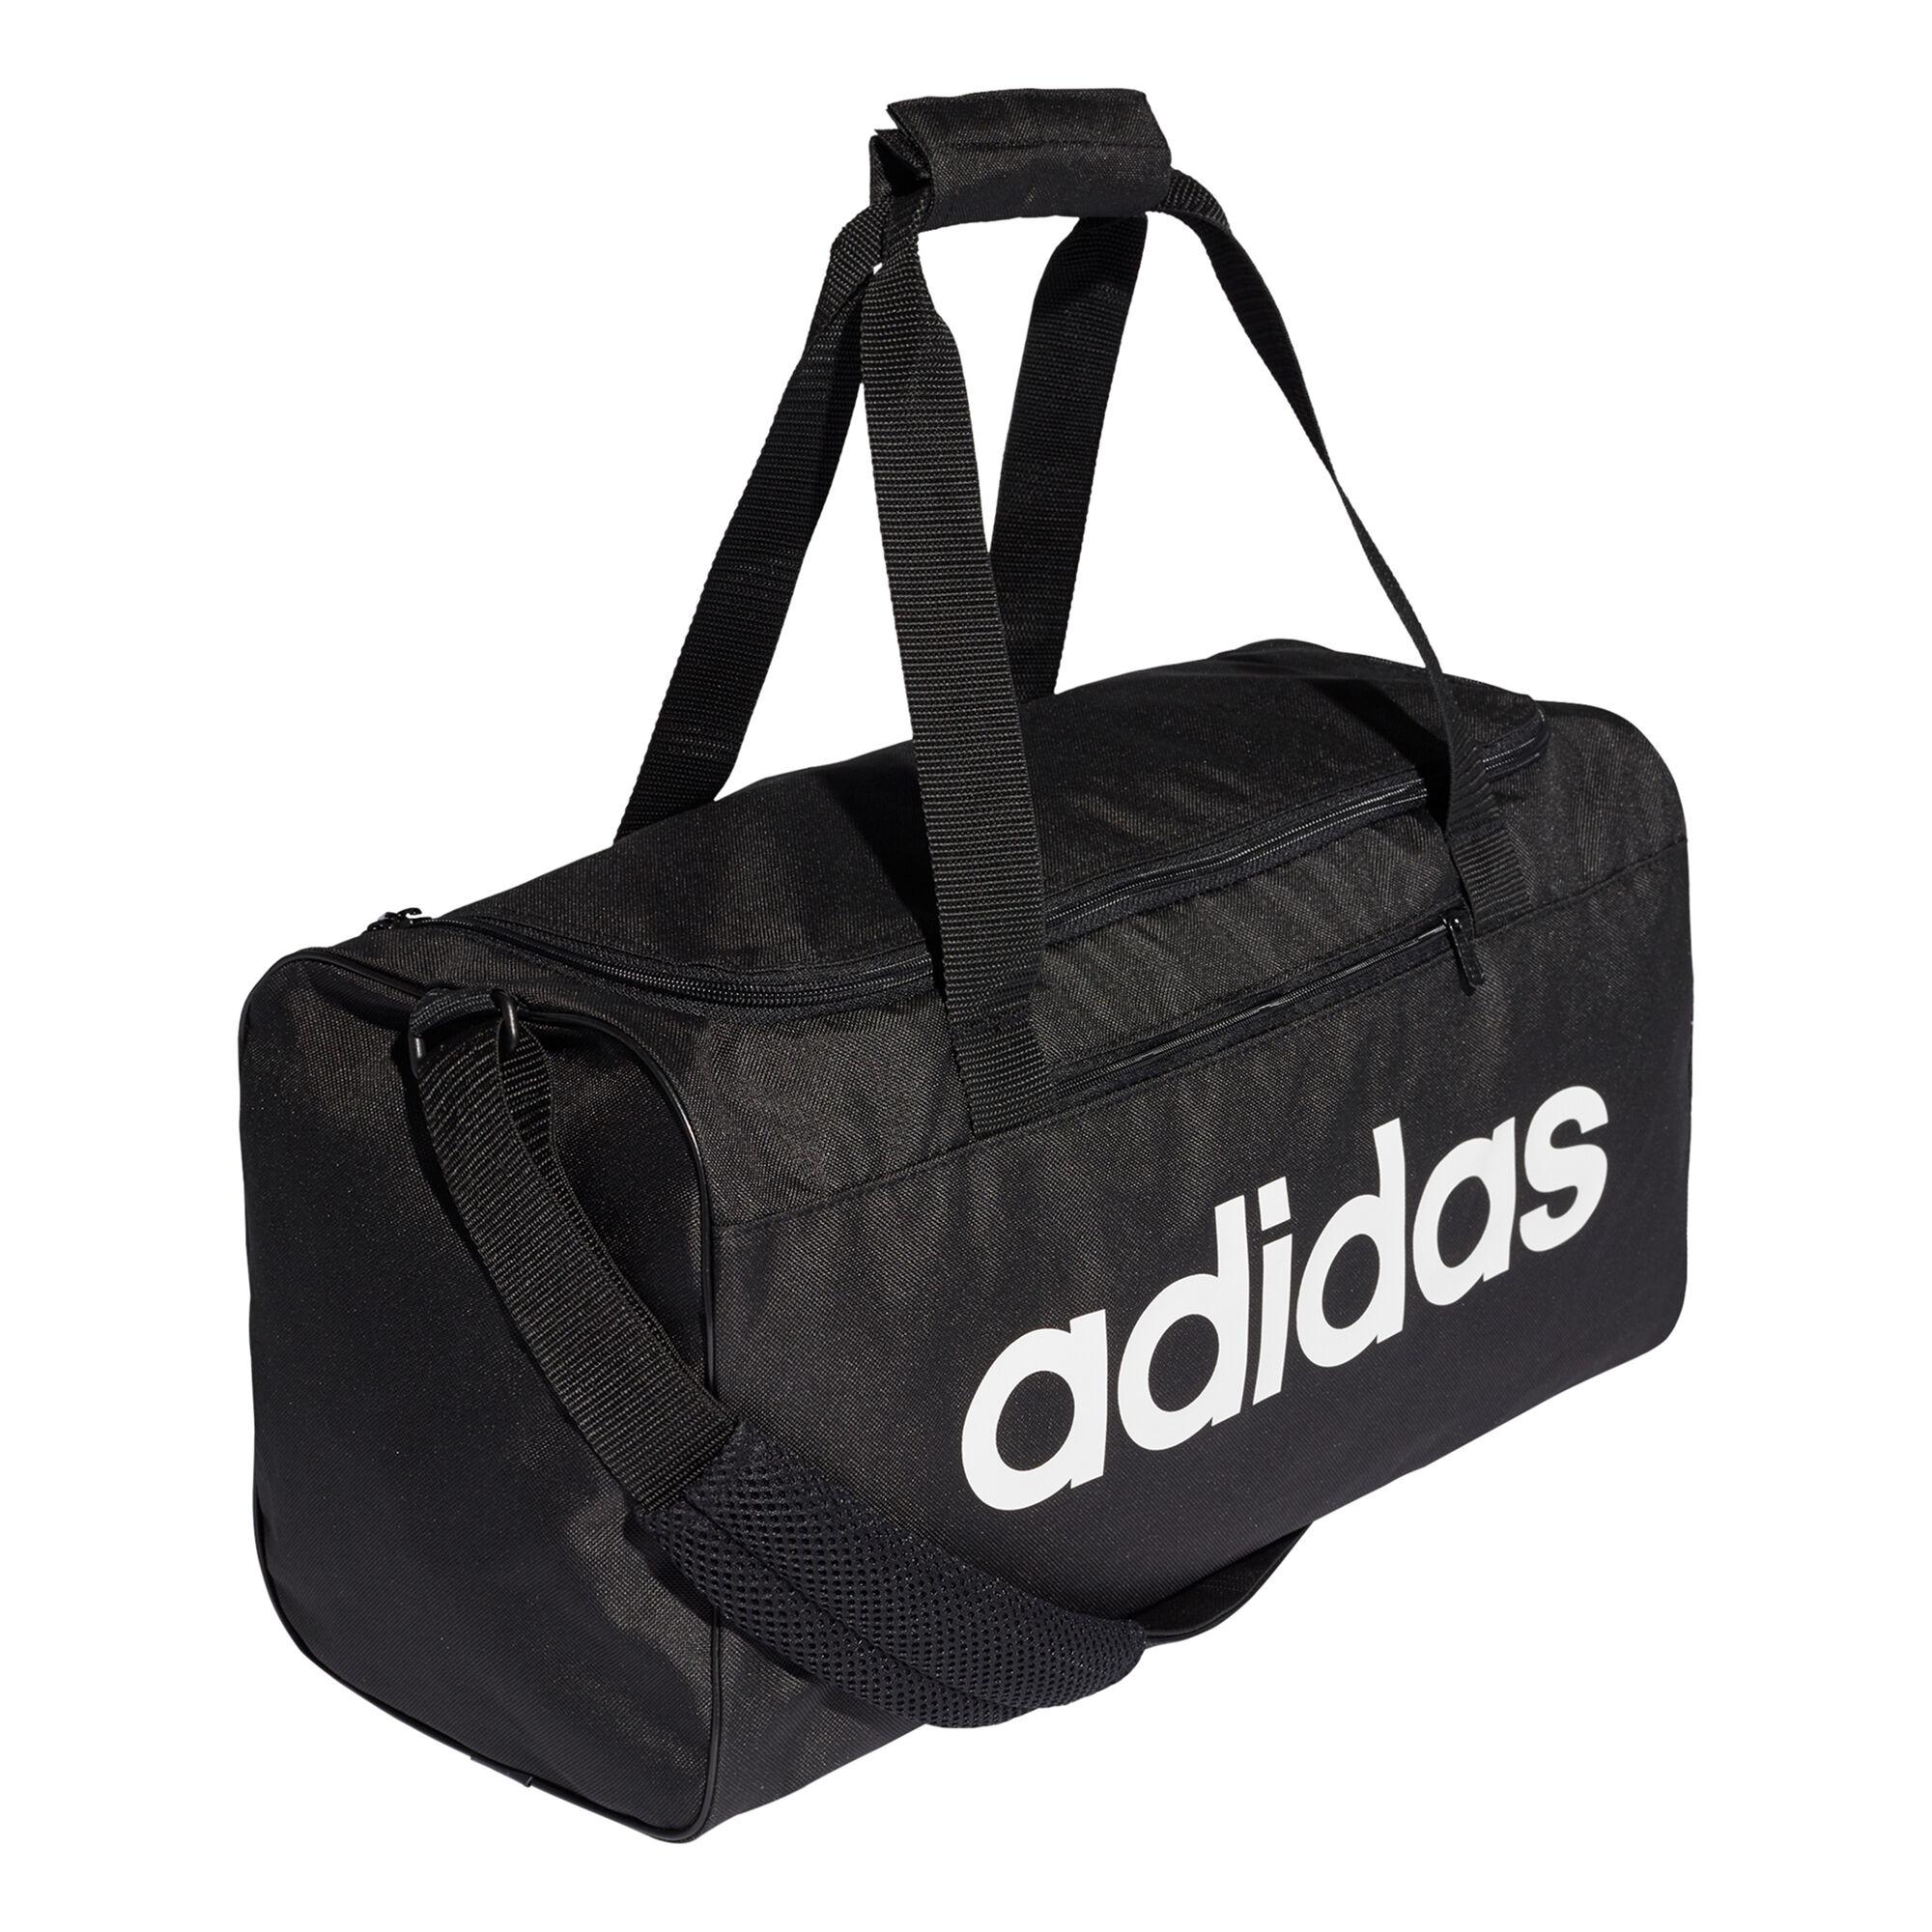 adidas  adidas  adidas  adidas  adidas  adidas  adidas  adidas  adidas. Linear  Core Duffel Bag Small ... 828e4deb153